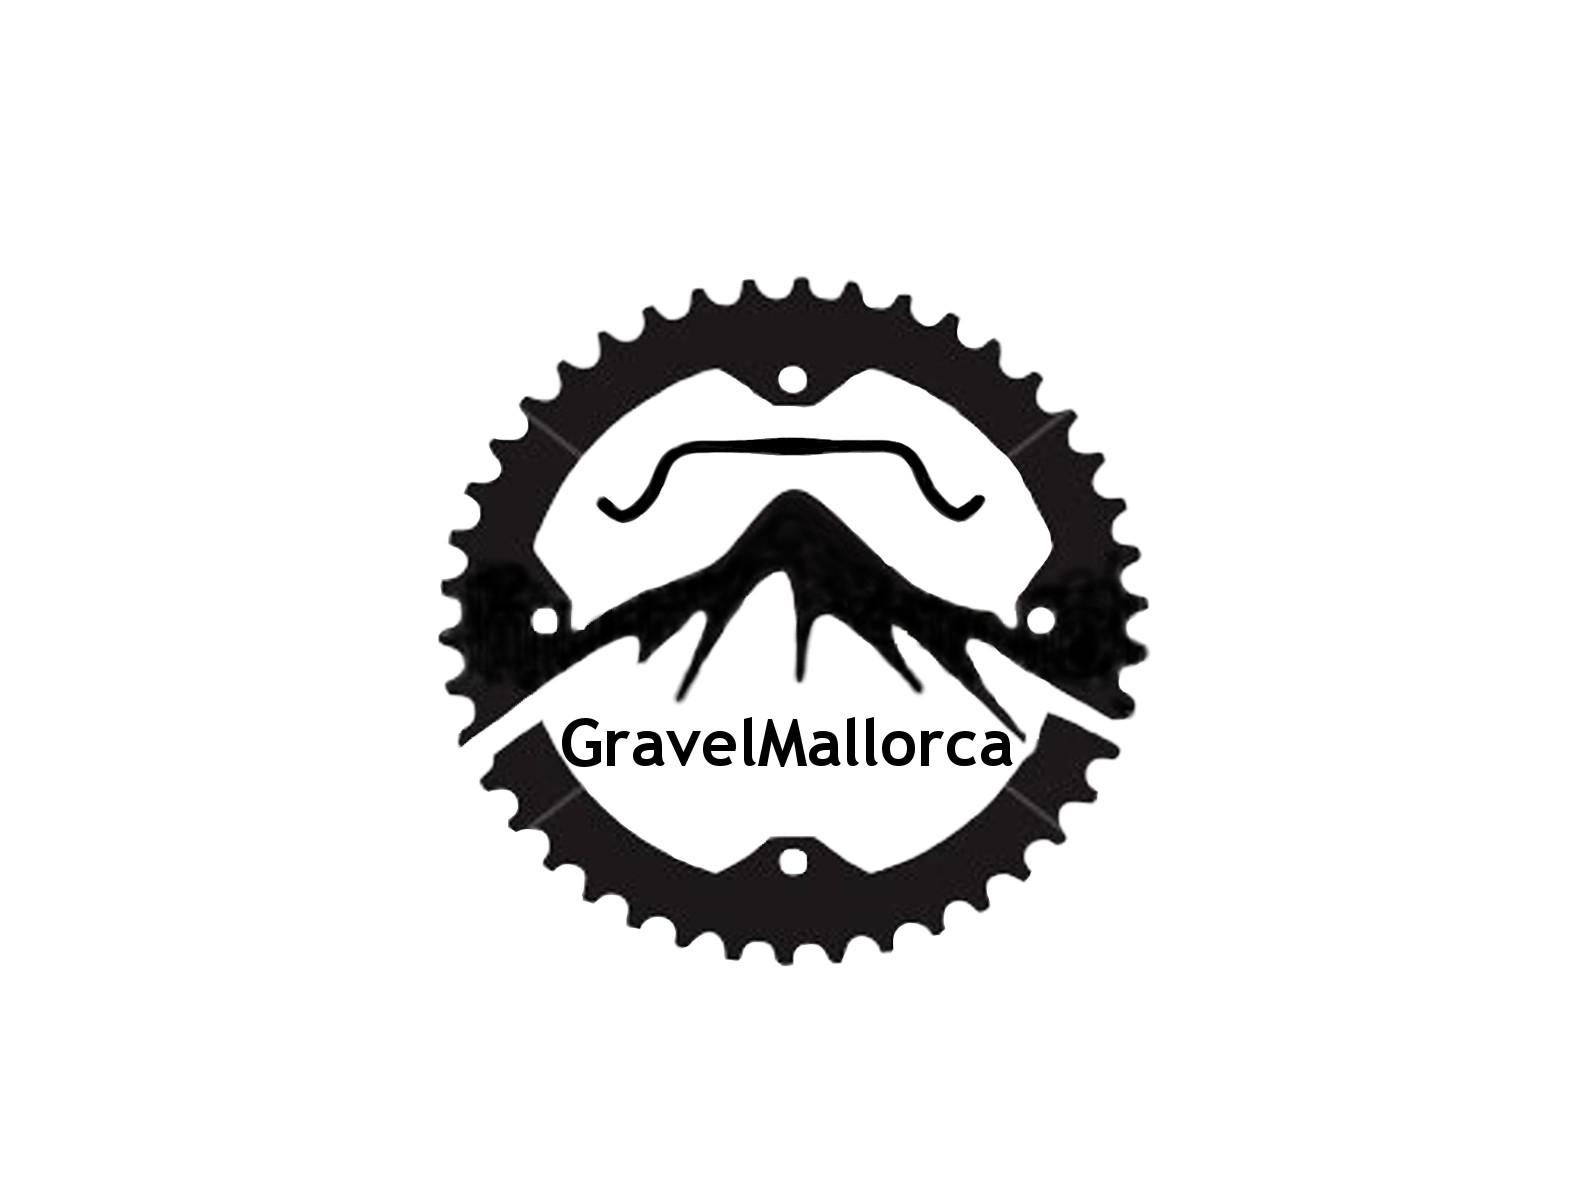 Gravel Mallorca